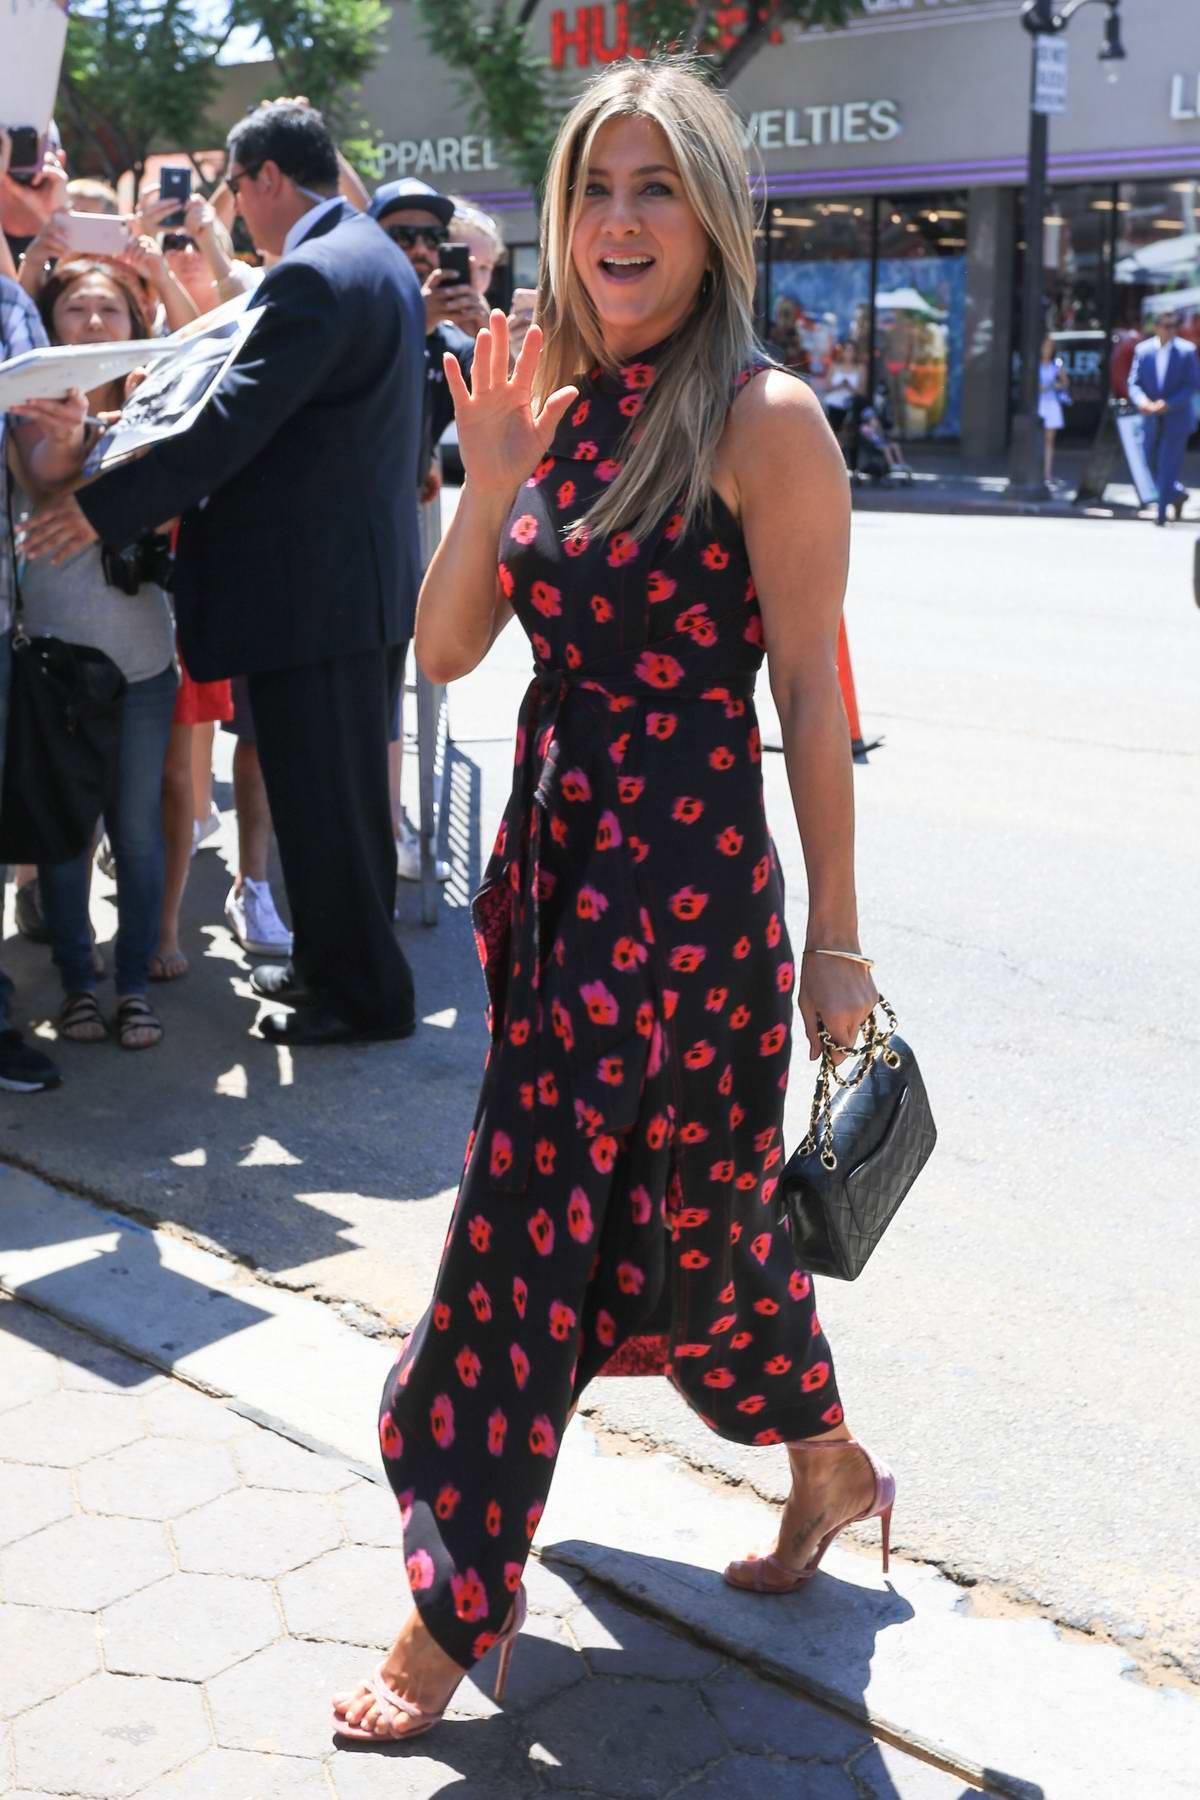 Jennifer Aniston at Jason Bateman's Hollywood Walk of Fame ceremony in Hollywood